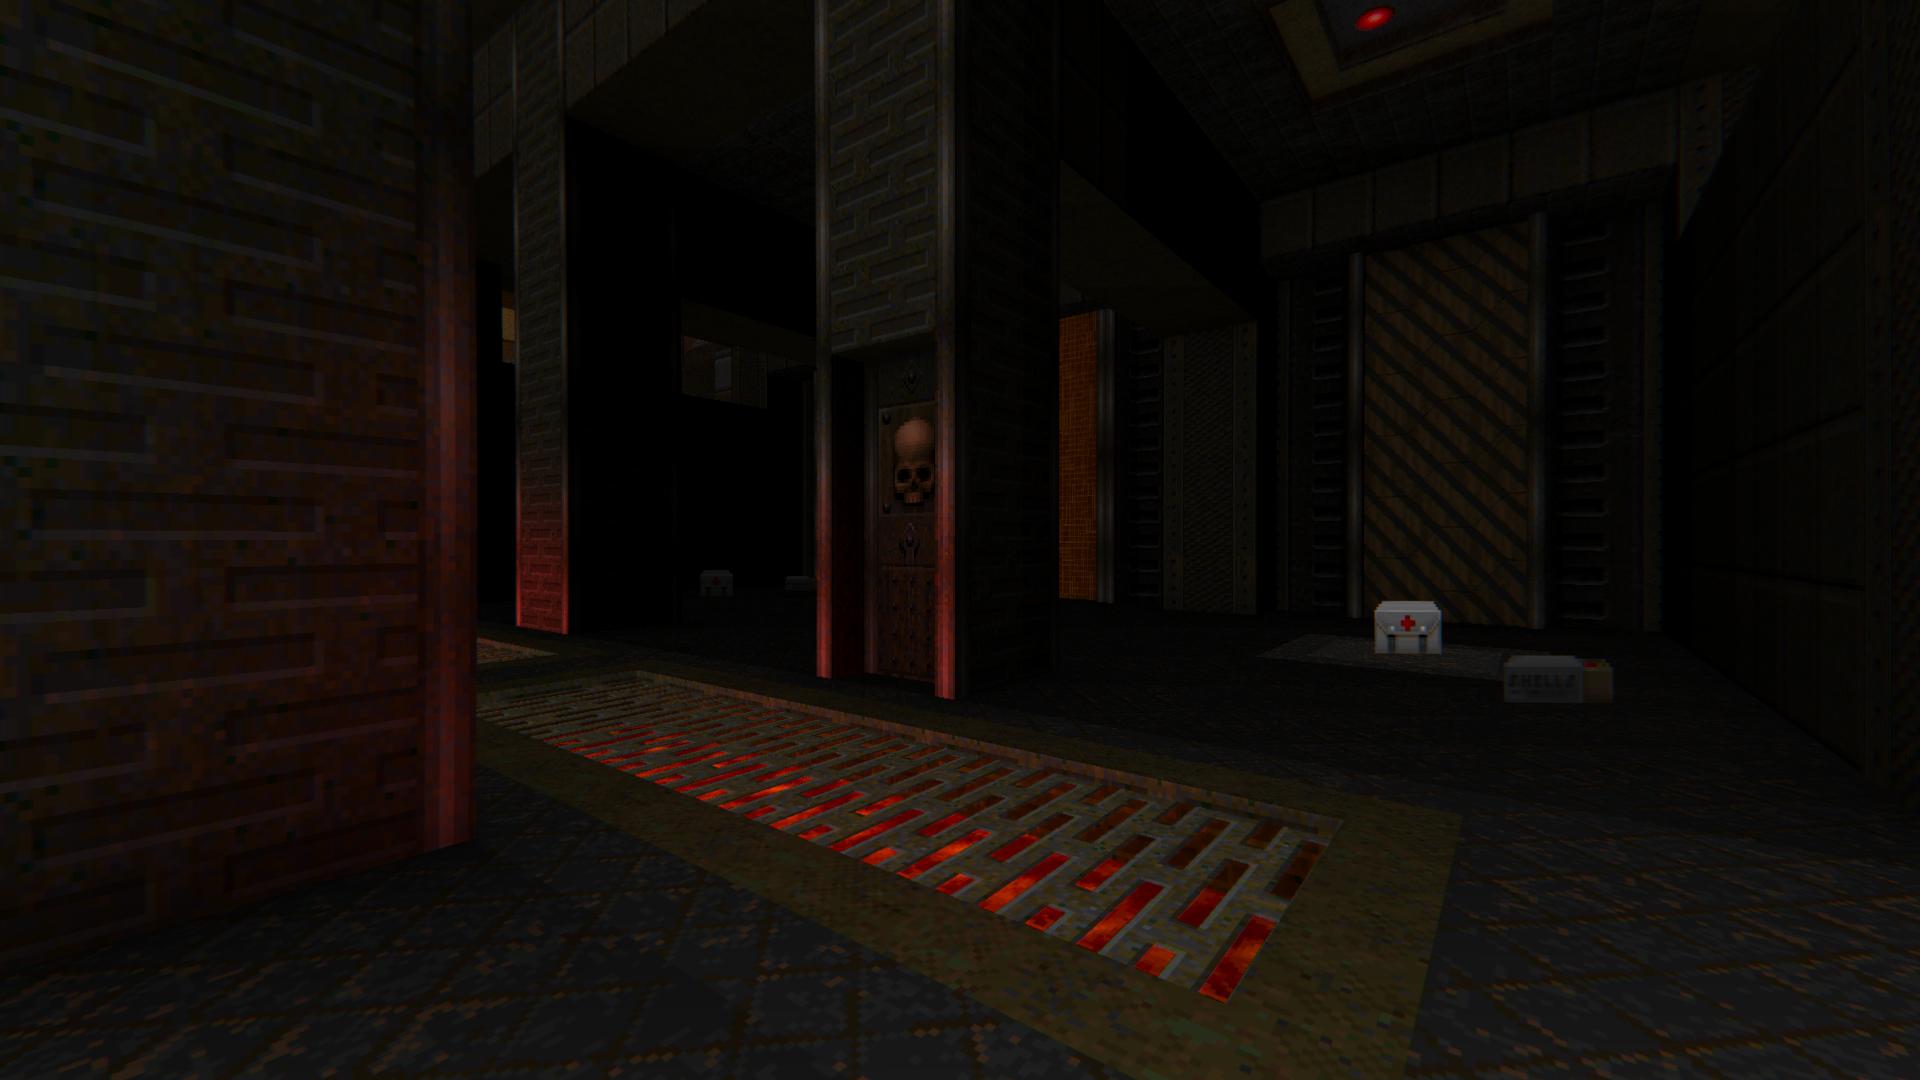 Screenshot_Doom_20210603_234455.png.9adacf4a3a313c86d9f70c151cf3ab0c.png